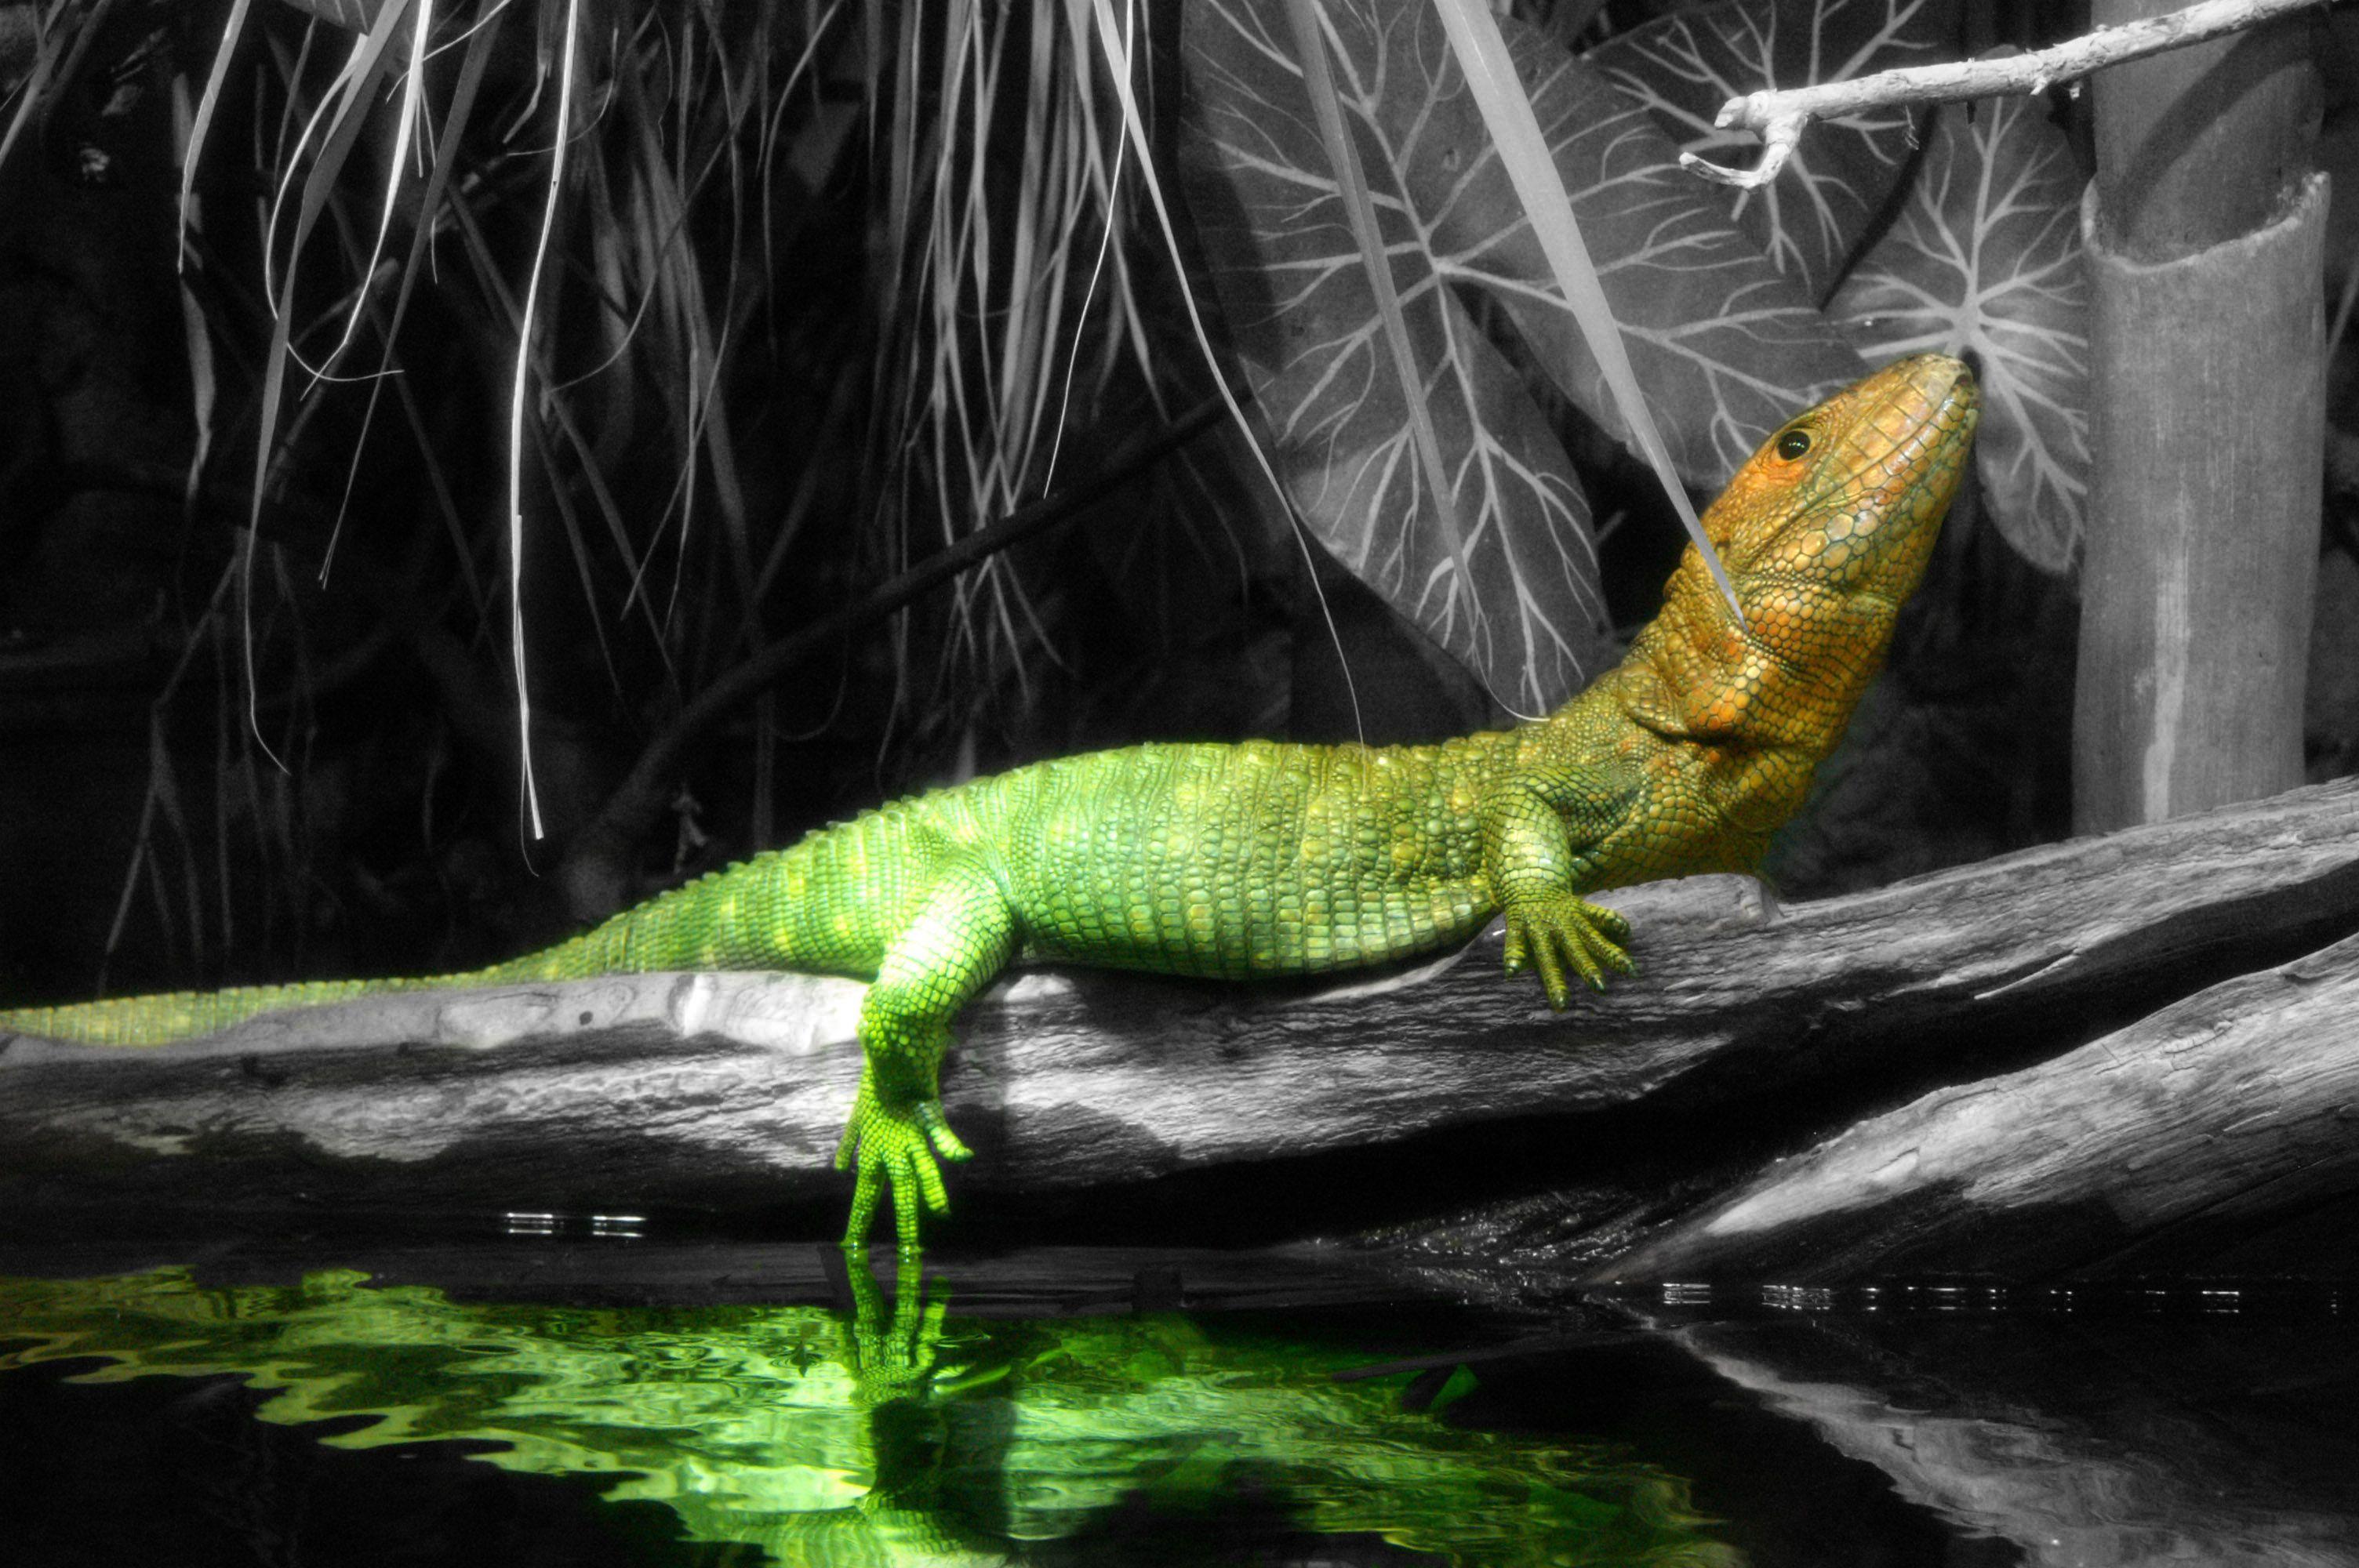 Color Splash By Supcowpur On DeviantArt